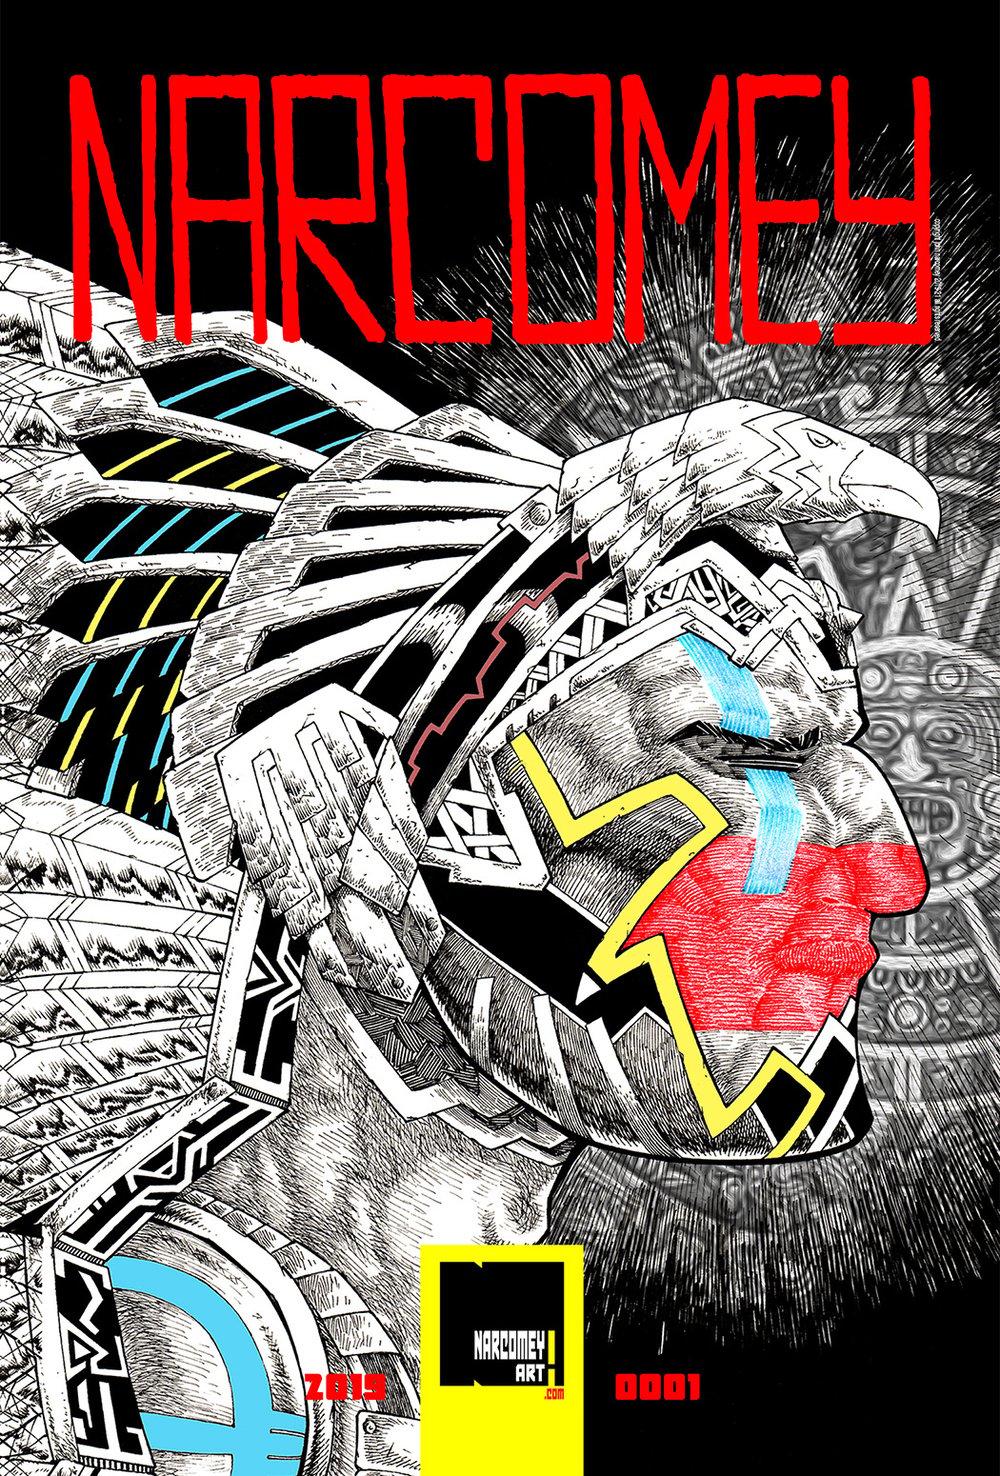 NARCOMEY ZINE, Vol. 001 Reg Edition